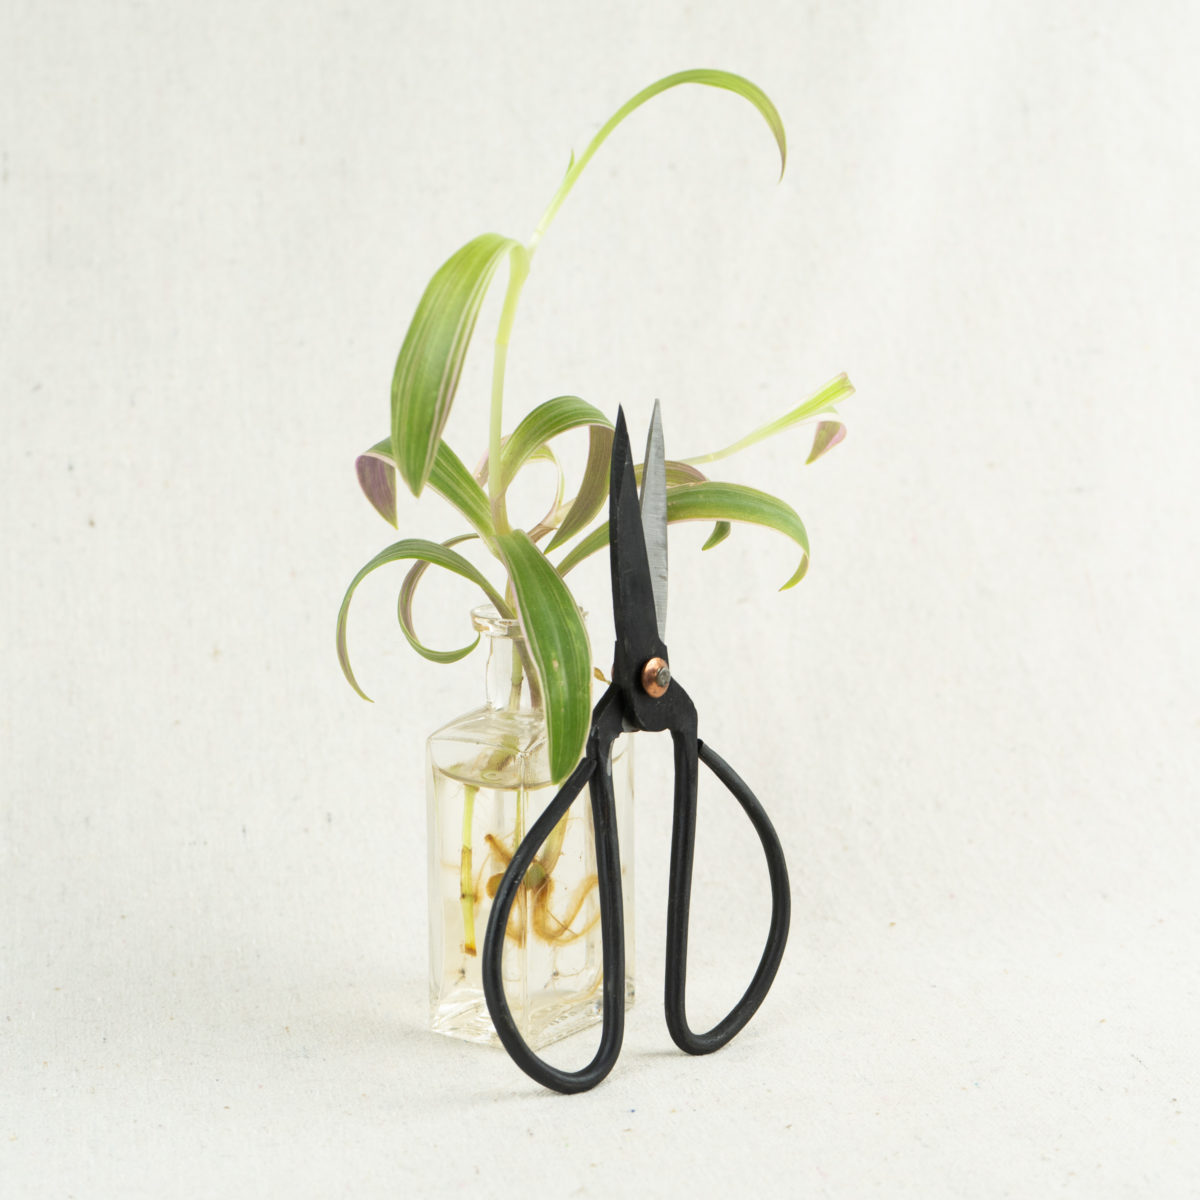 iron-garden-snips